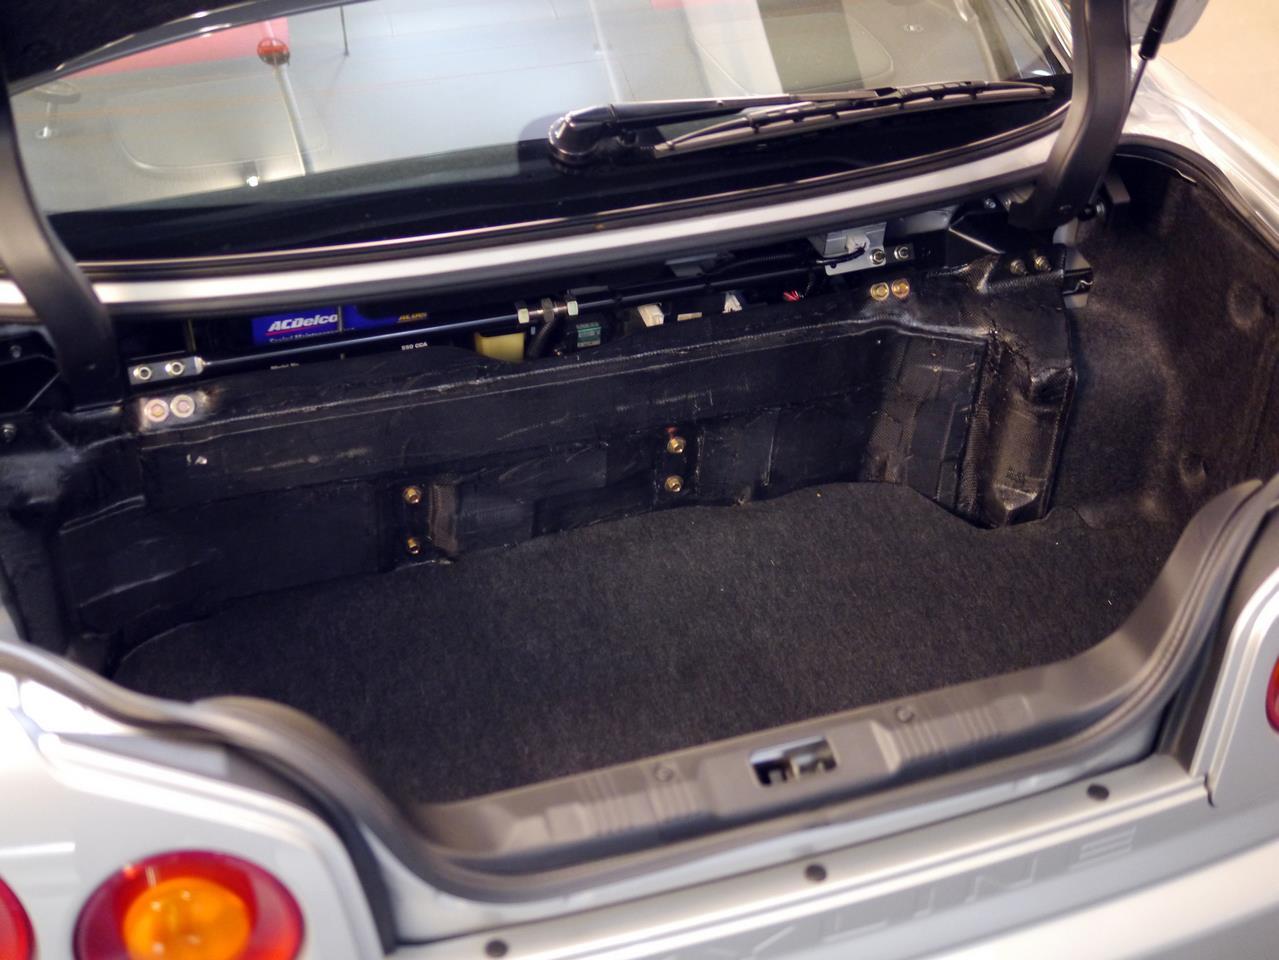 Nismo Nissan GT-R R34 Z -Tune for sale (2)